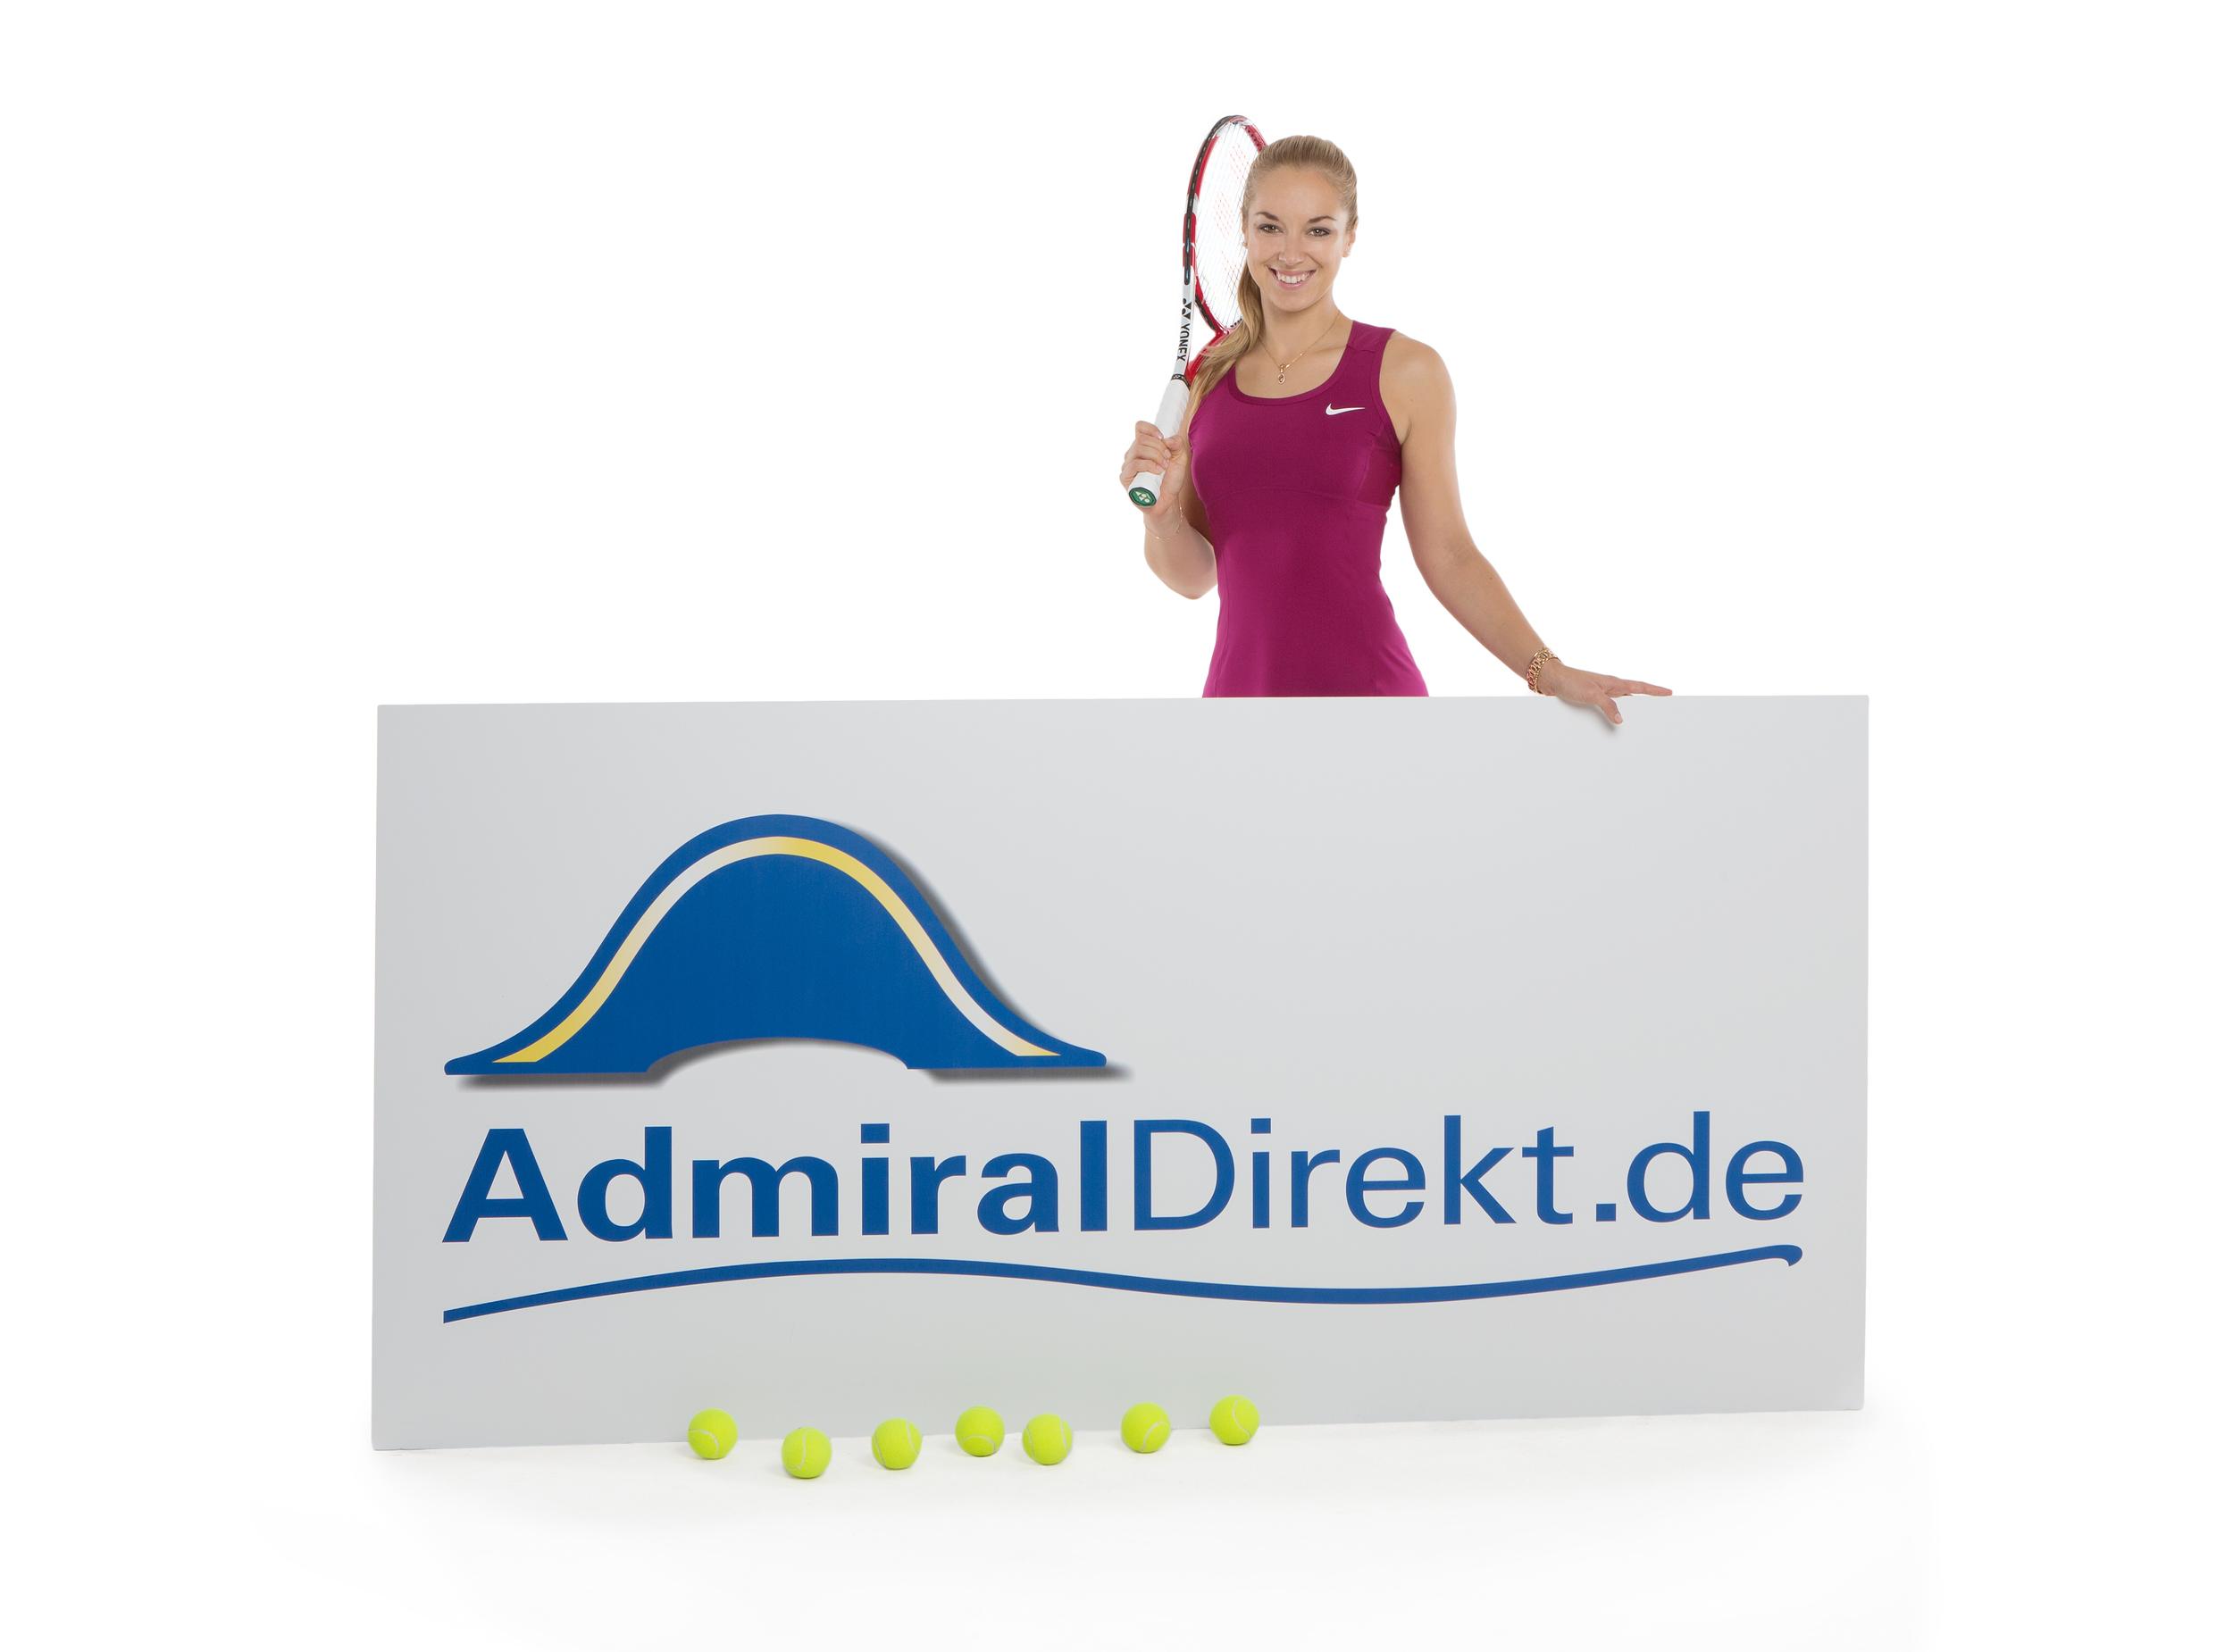 Businessfotografie: Sabine Lisicki | Admiral-direkt.de